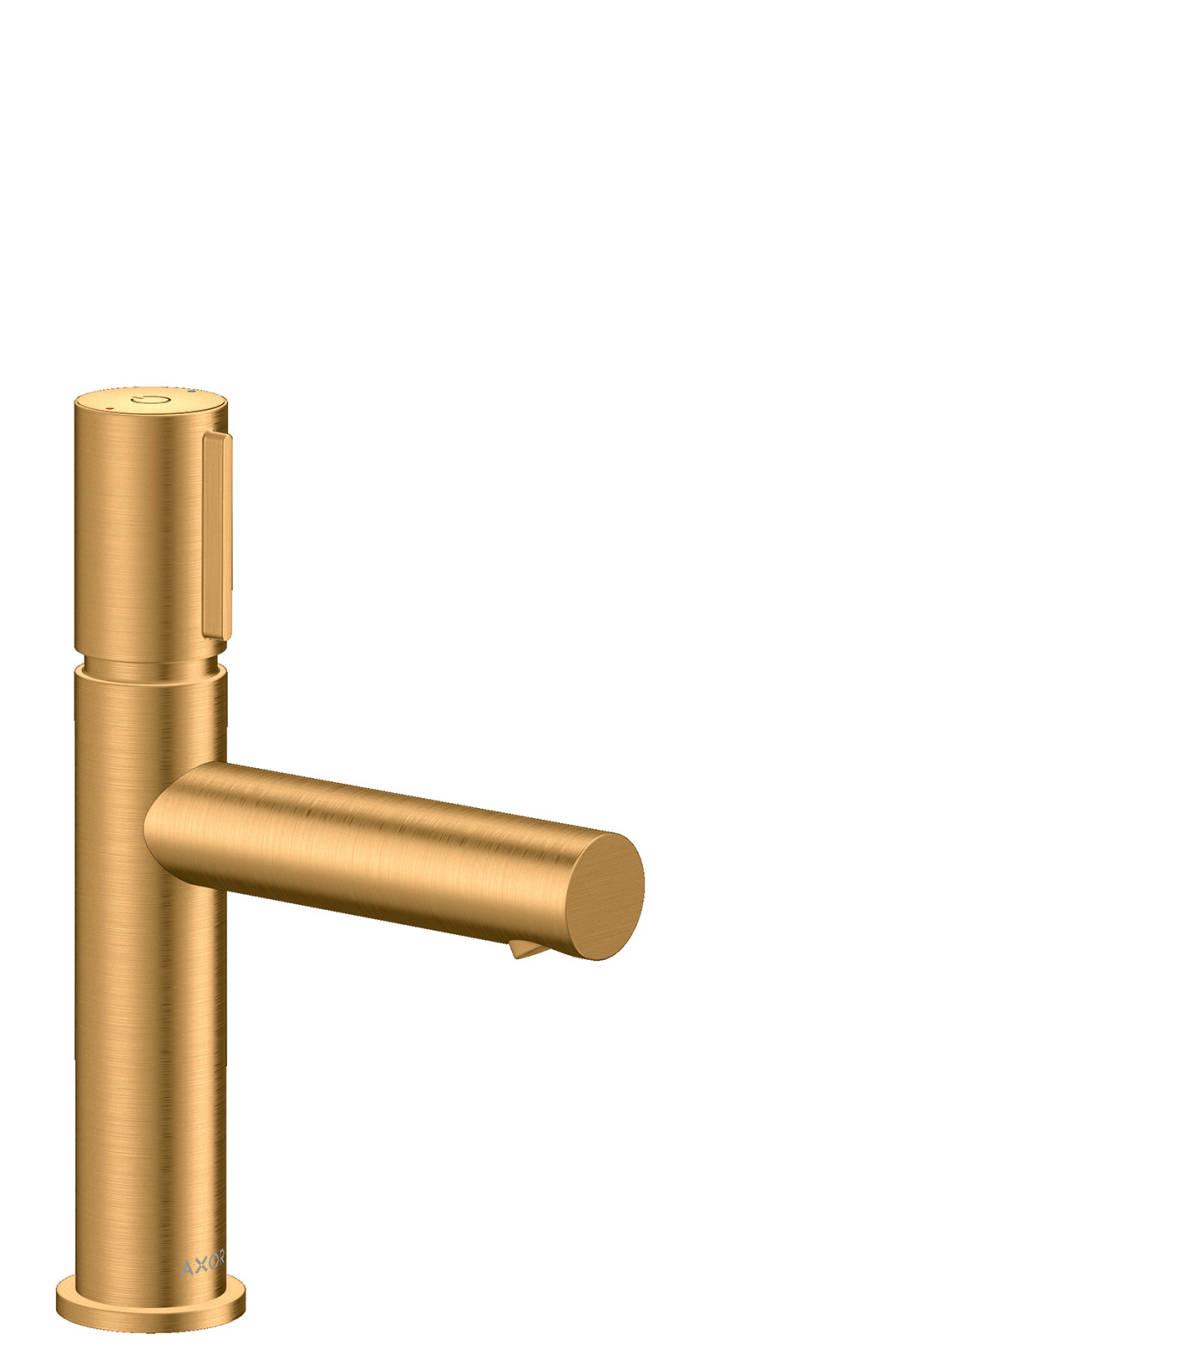 Basin mixer Select 110 with waste set, Brushed Gold Optic, 45012250